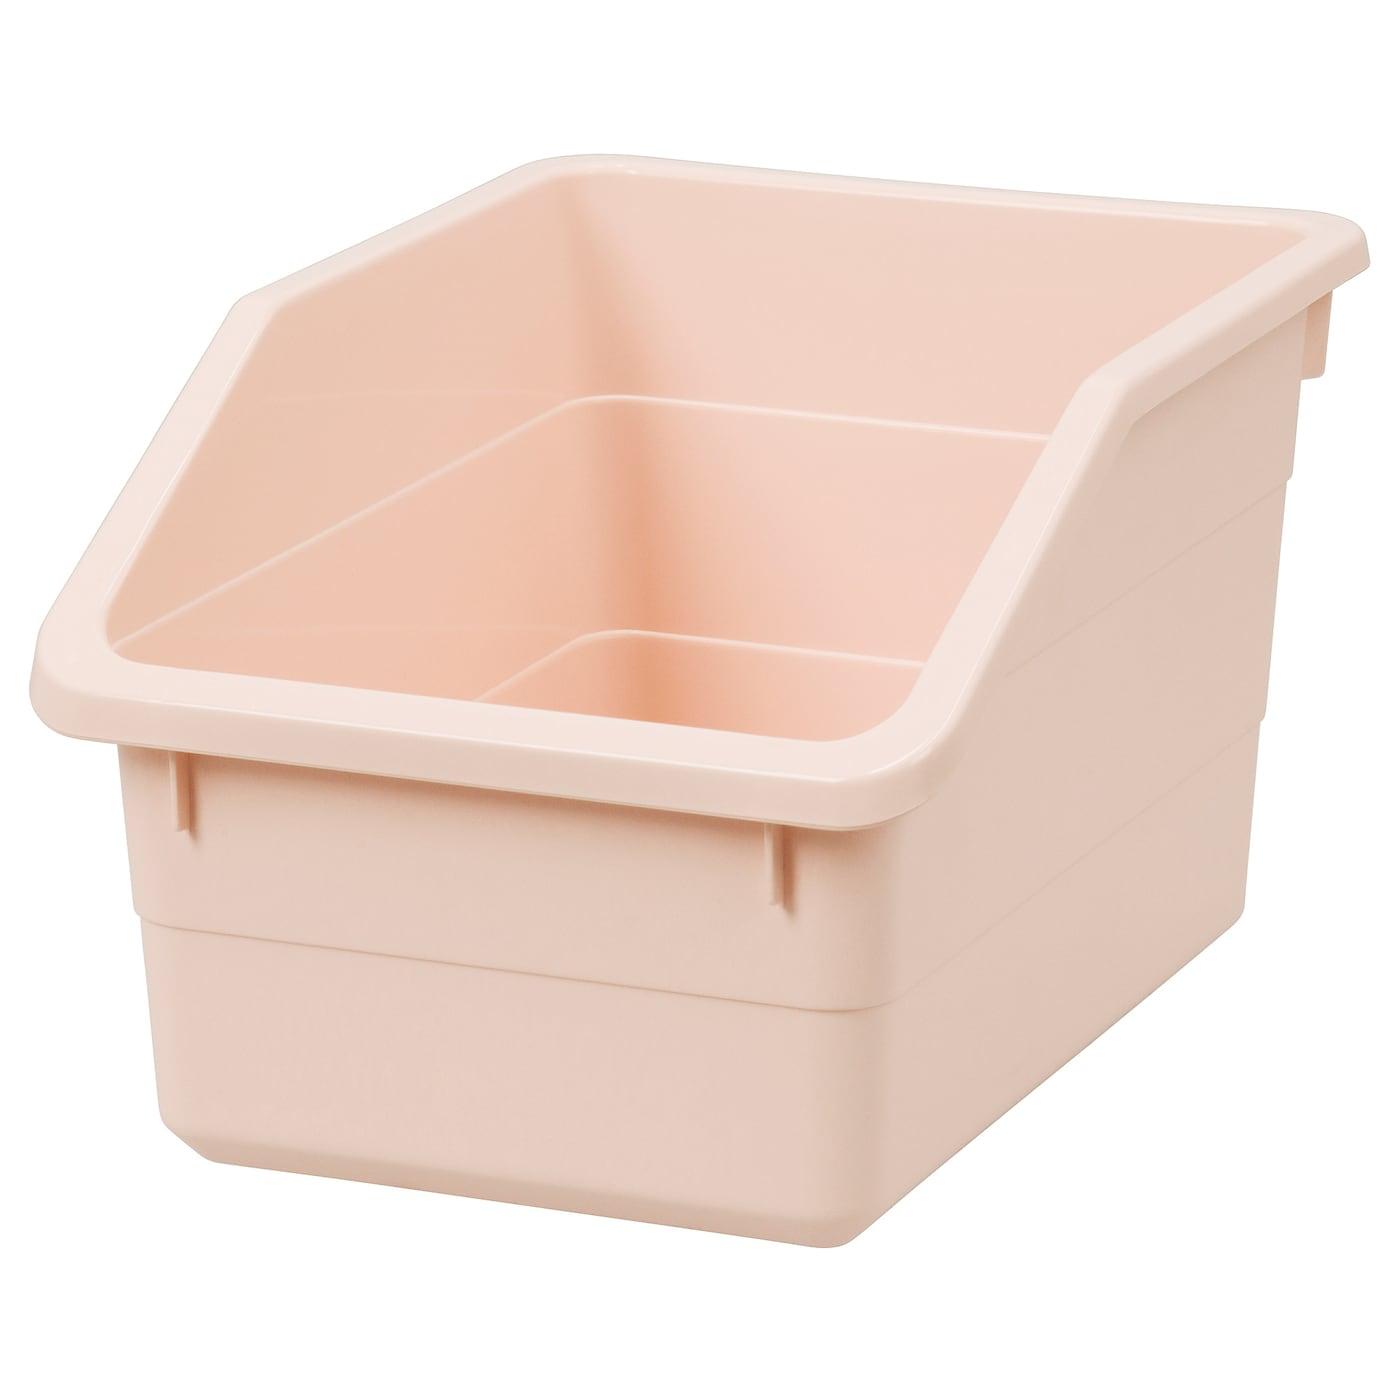 SOCKERBIT pink, Box, 19x26x15 cm